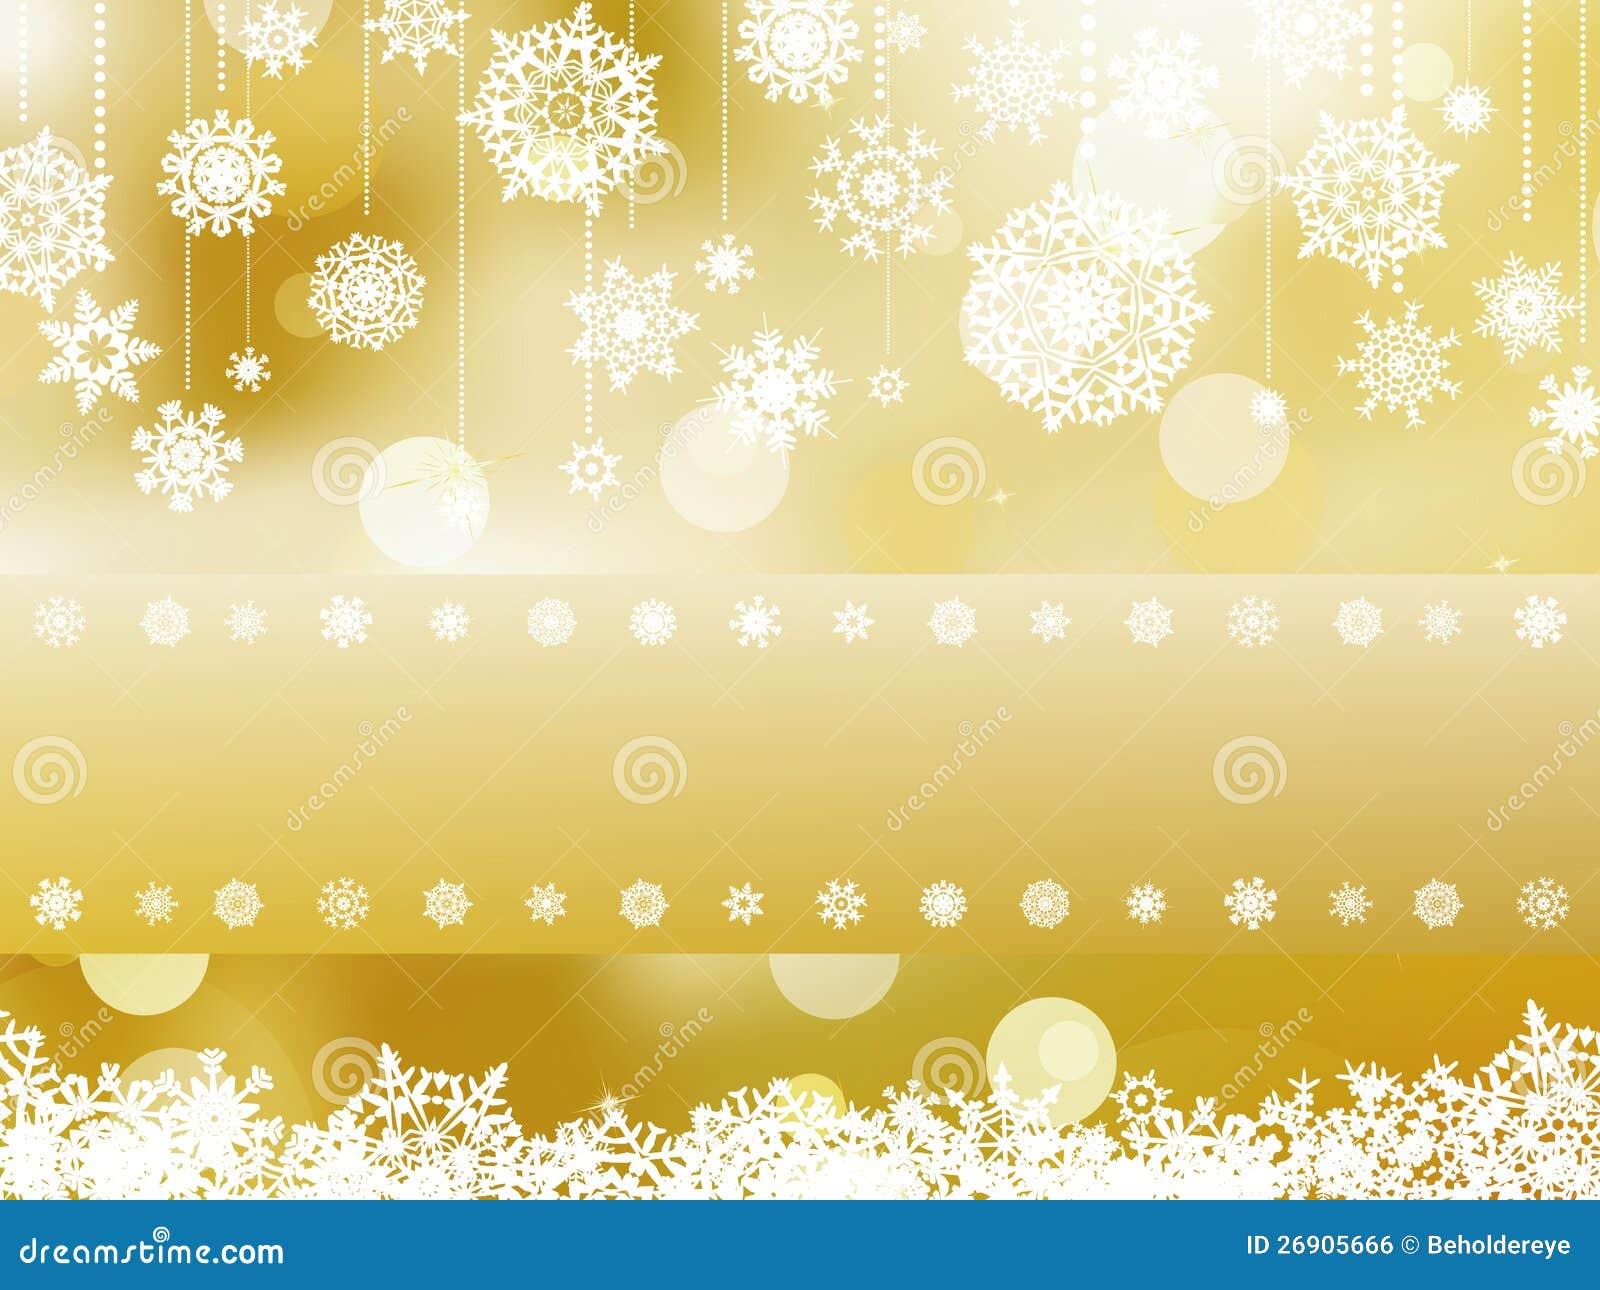 Elegant Christmas Background: Elegant Christmas Background Invitation. EPS 8 Stock